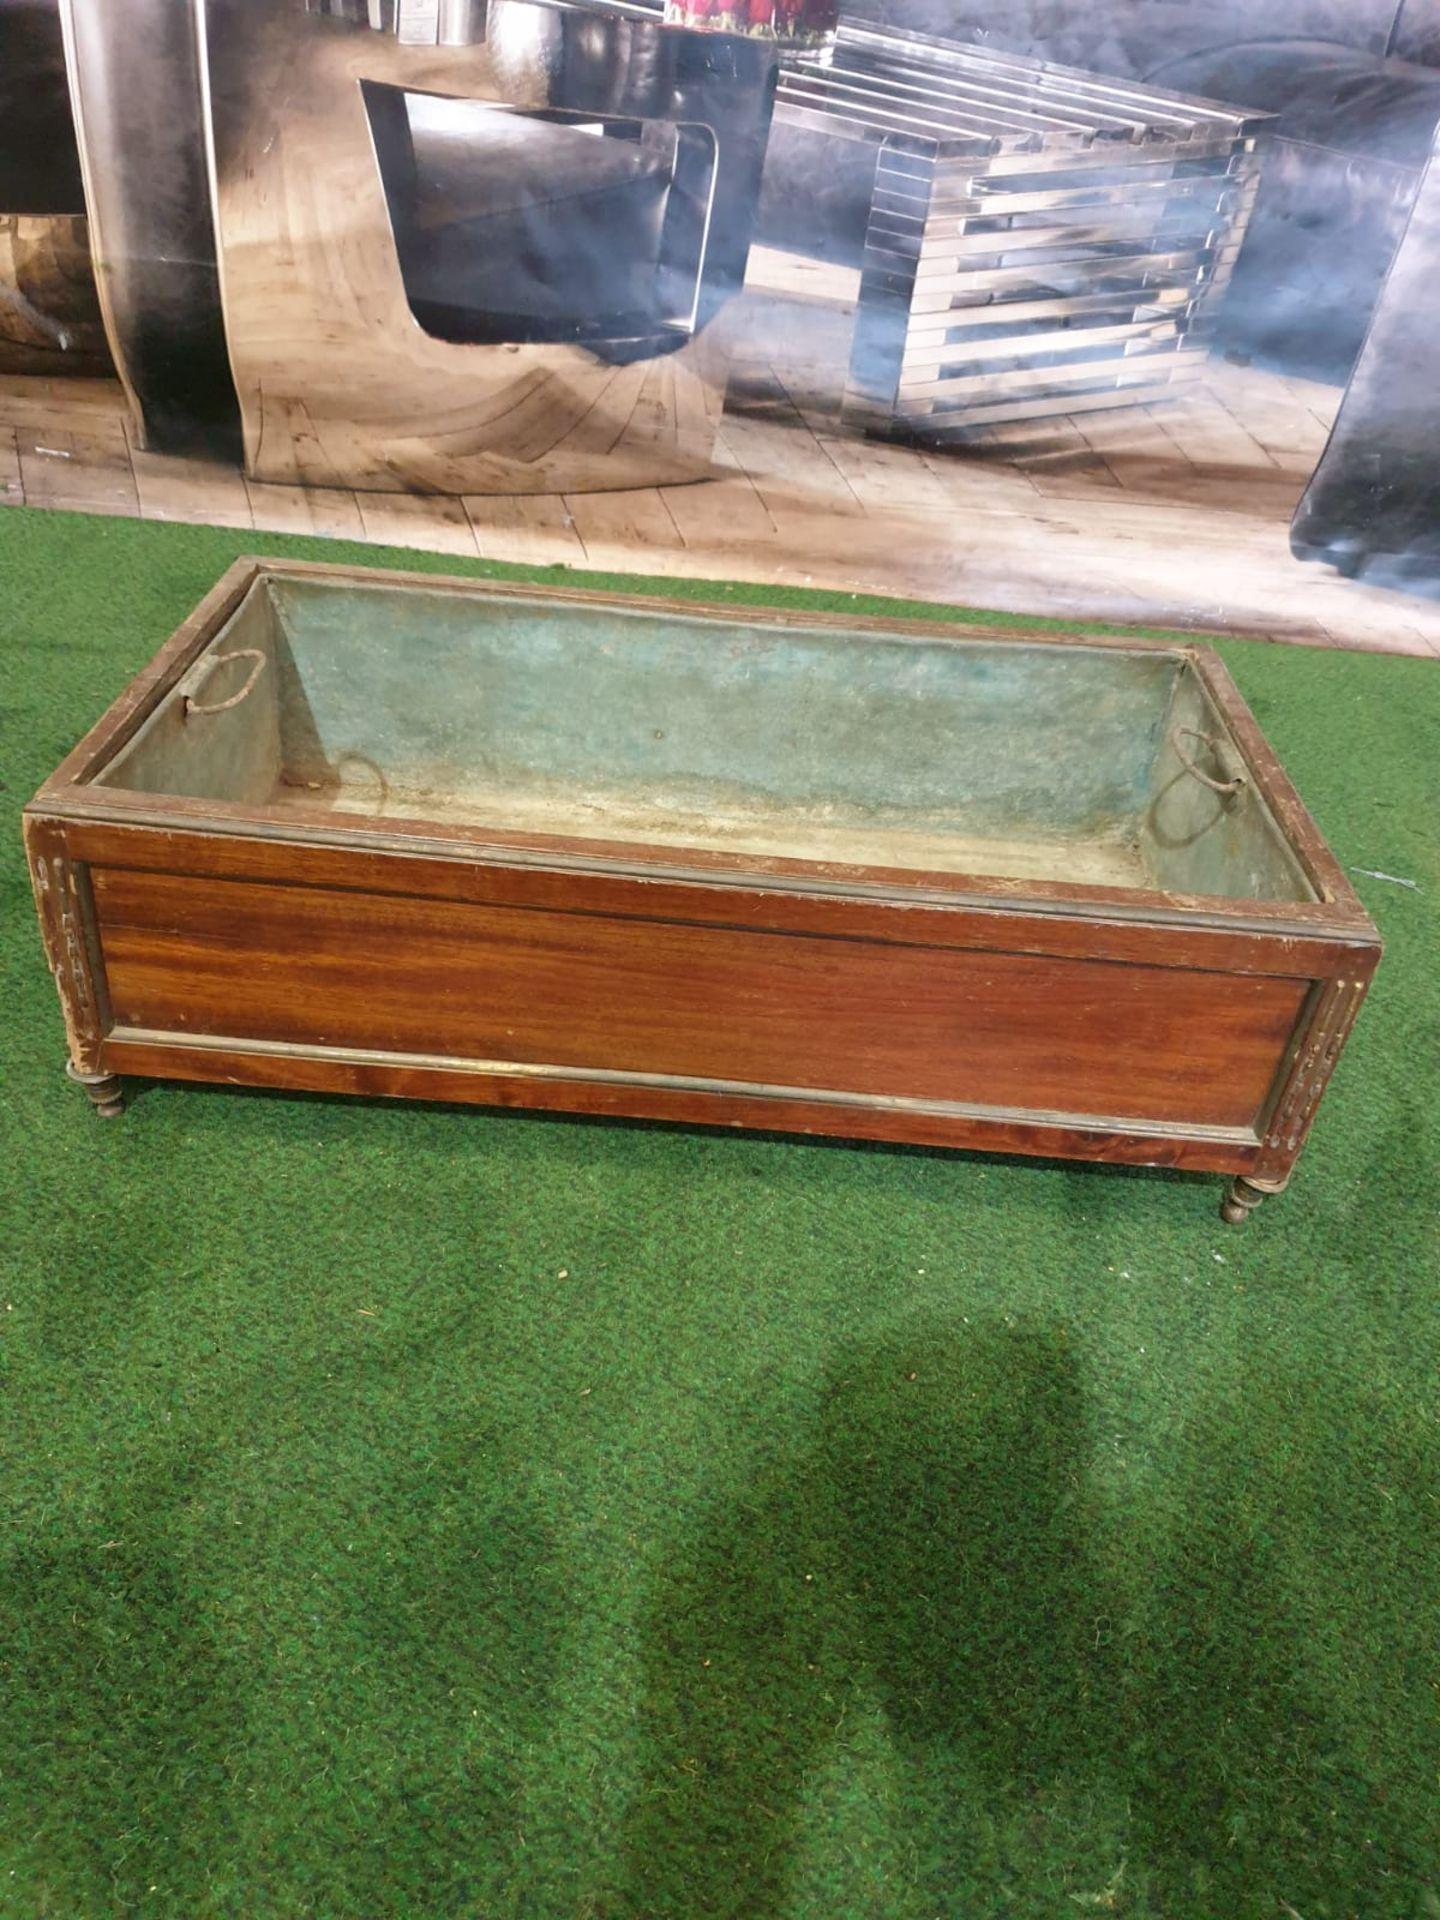 A Regency style Inlaid Mahogany Planter trough with original metal insert on shaped bun feet 65 x 35